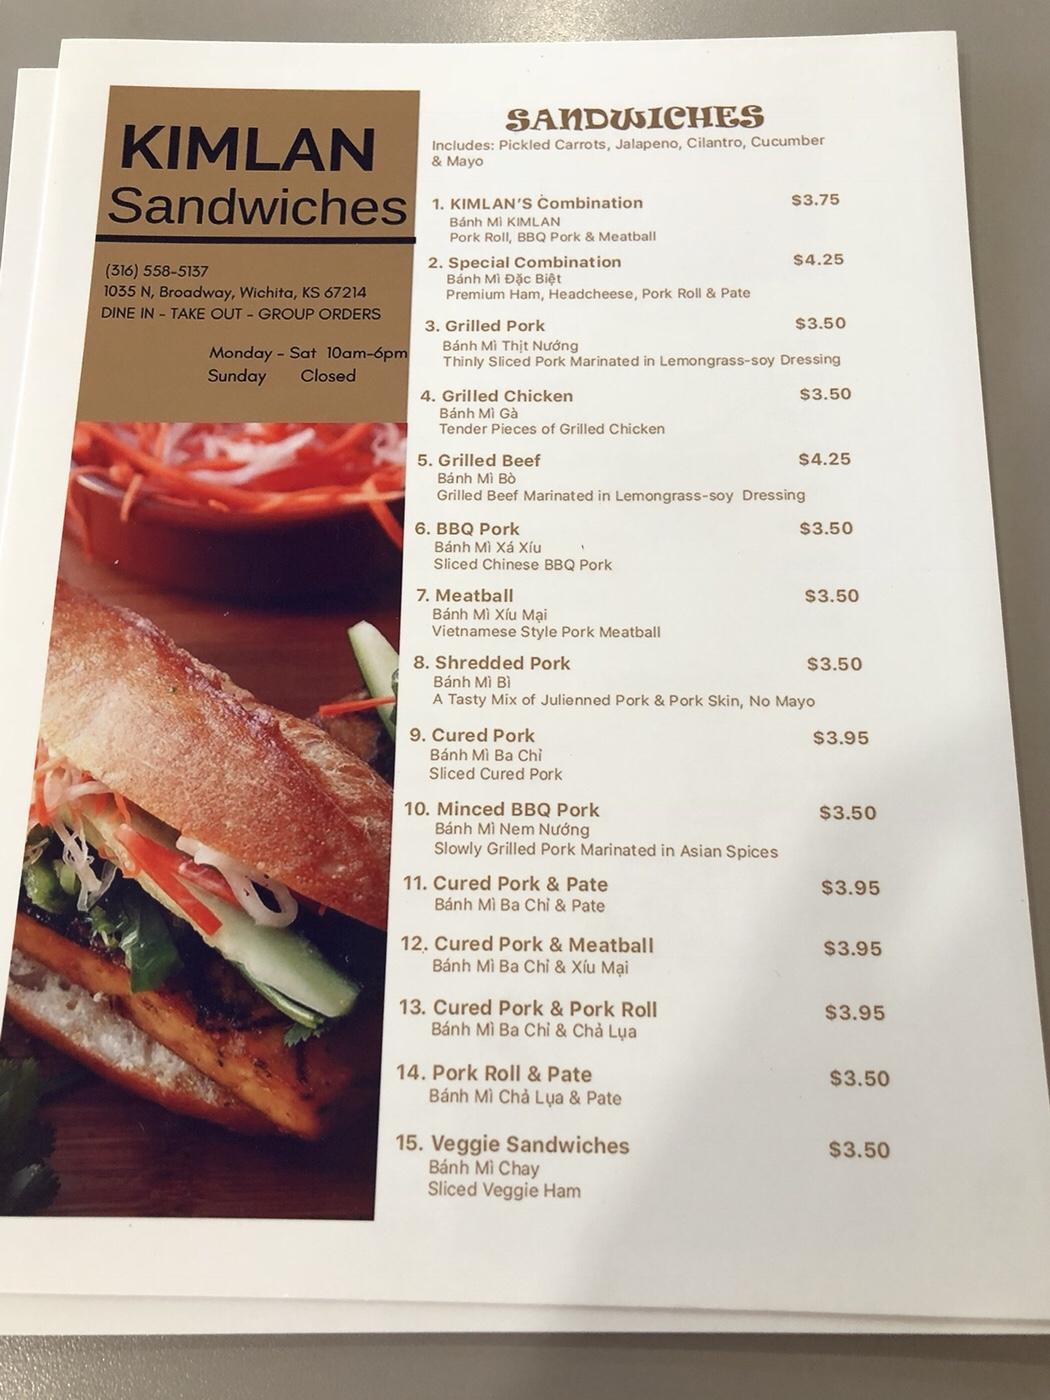 Kimlan Sandwiches